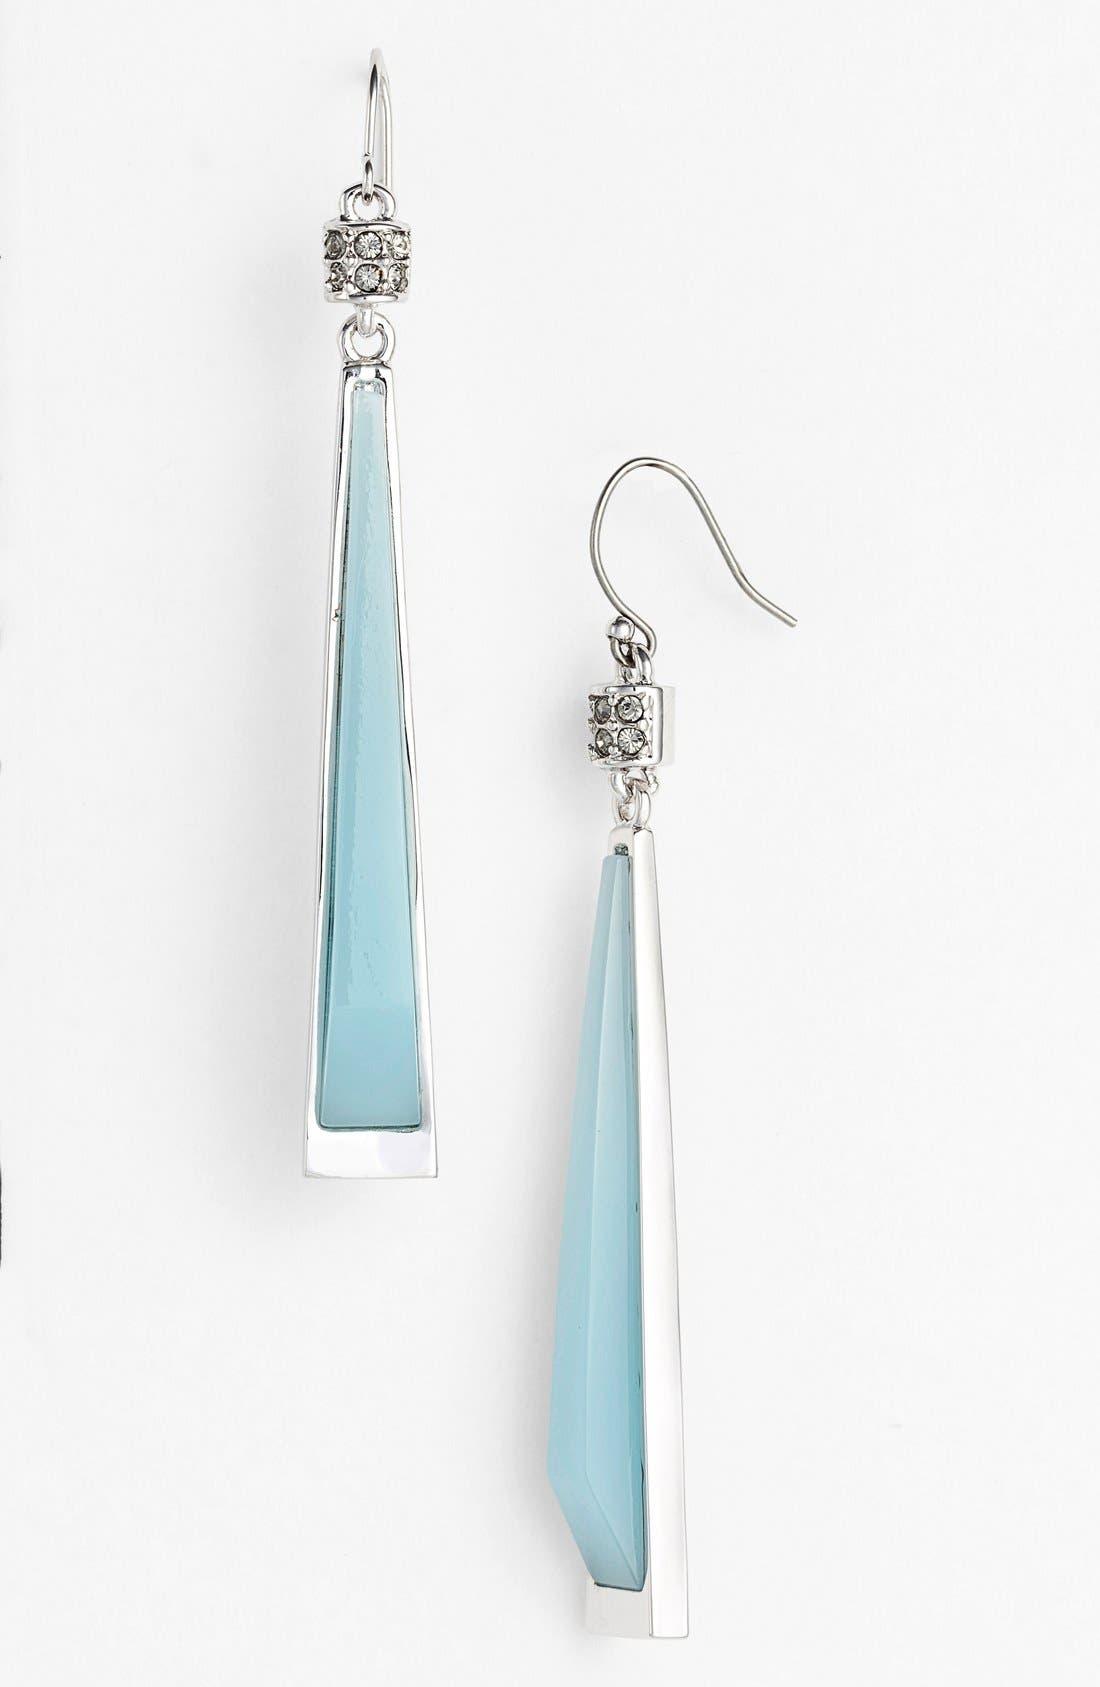 Main Image - Vince Camuto 'Blue Steel Silver' Drop Earrings